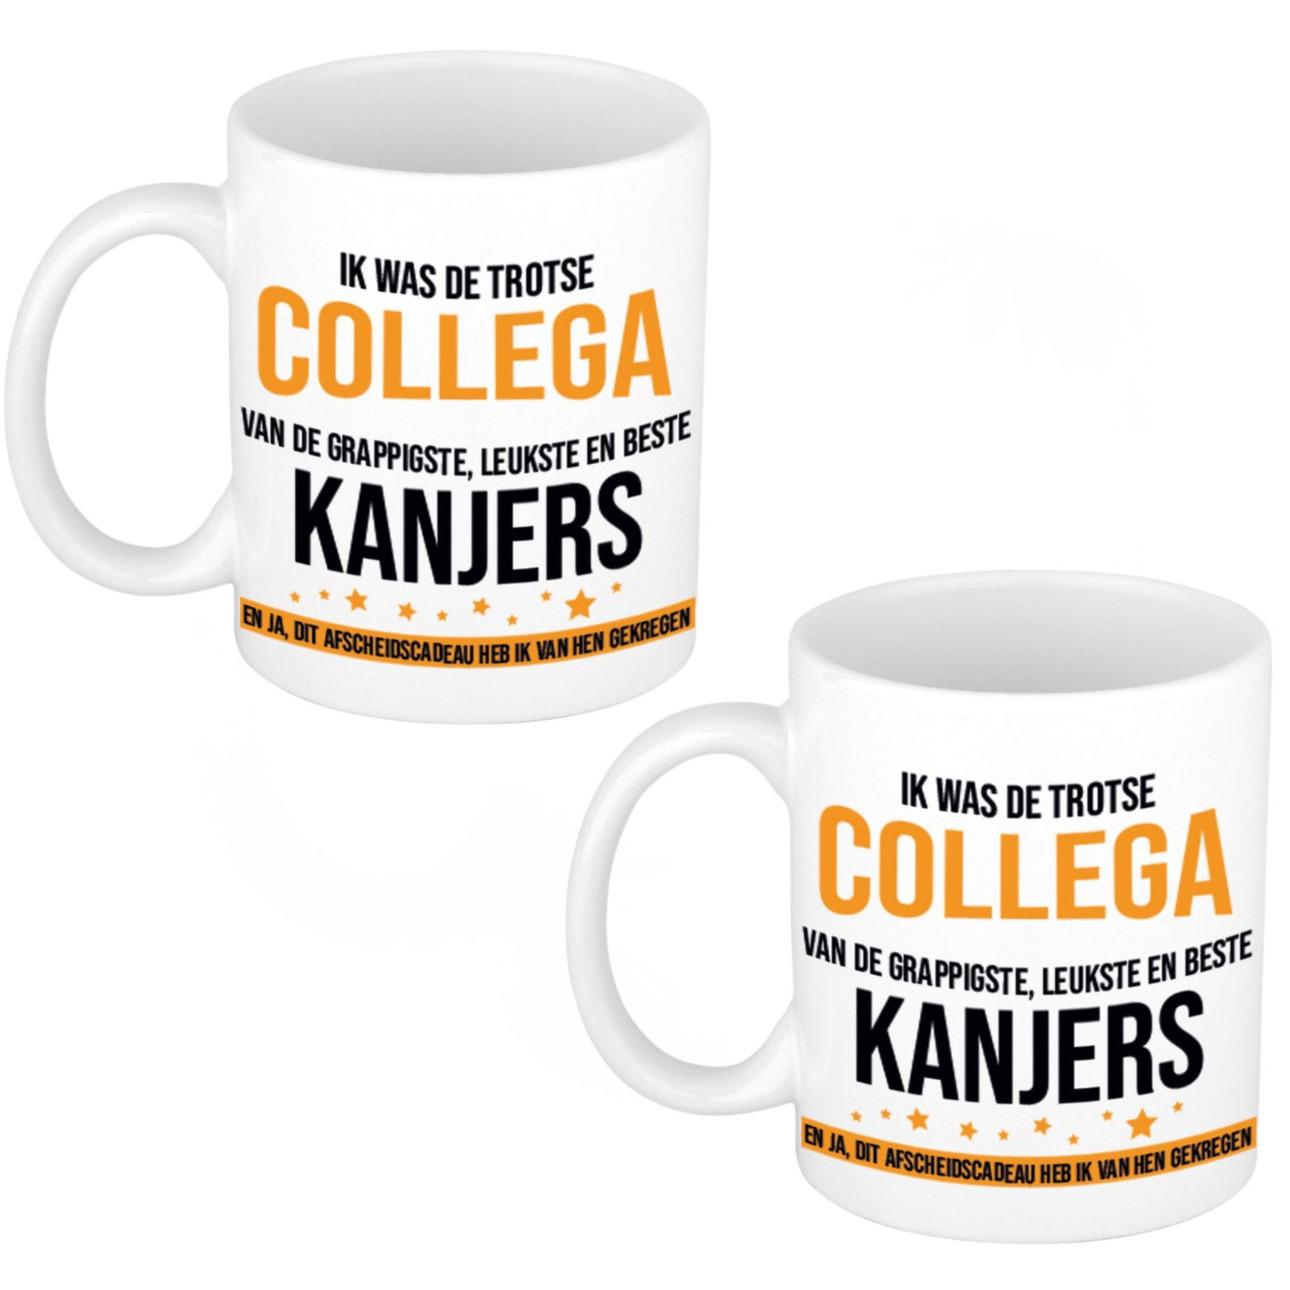 2x stuks trotse collega kanjers afscheidscadeau koffiemok - theebeker 300 ml